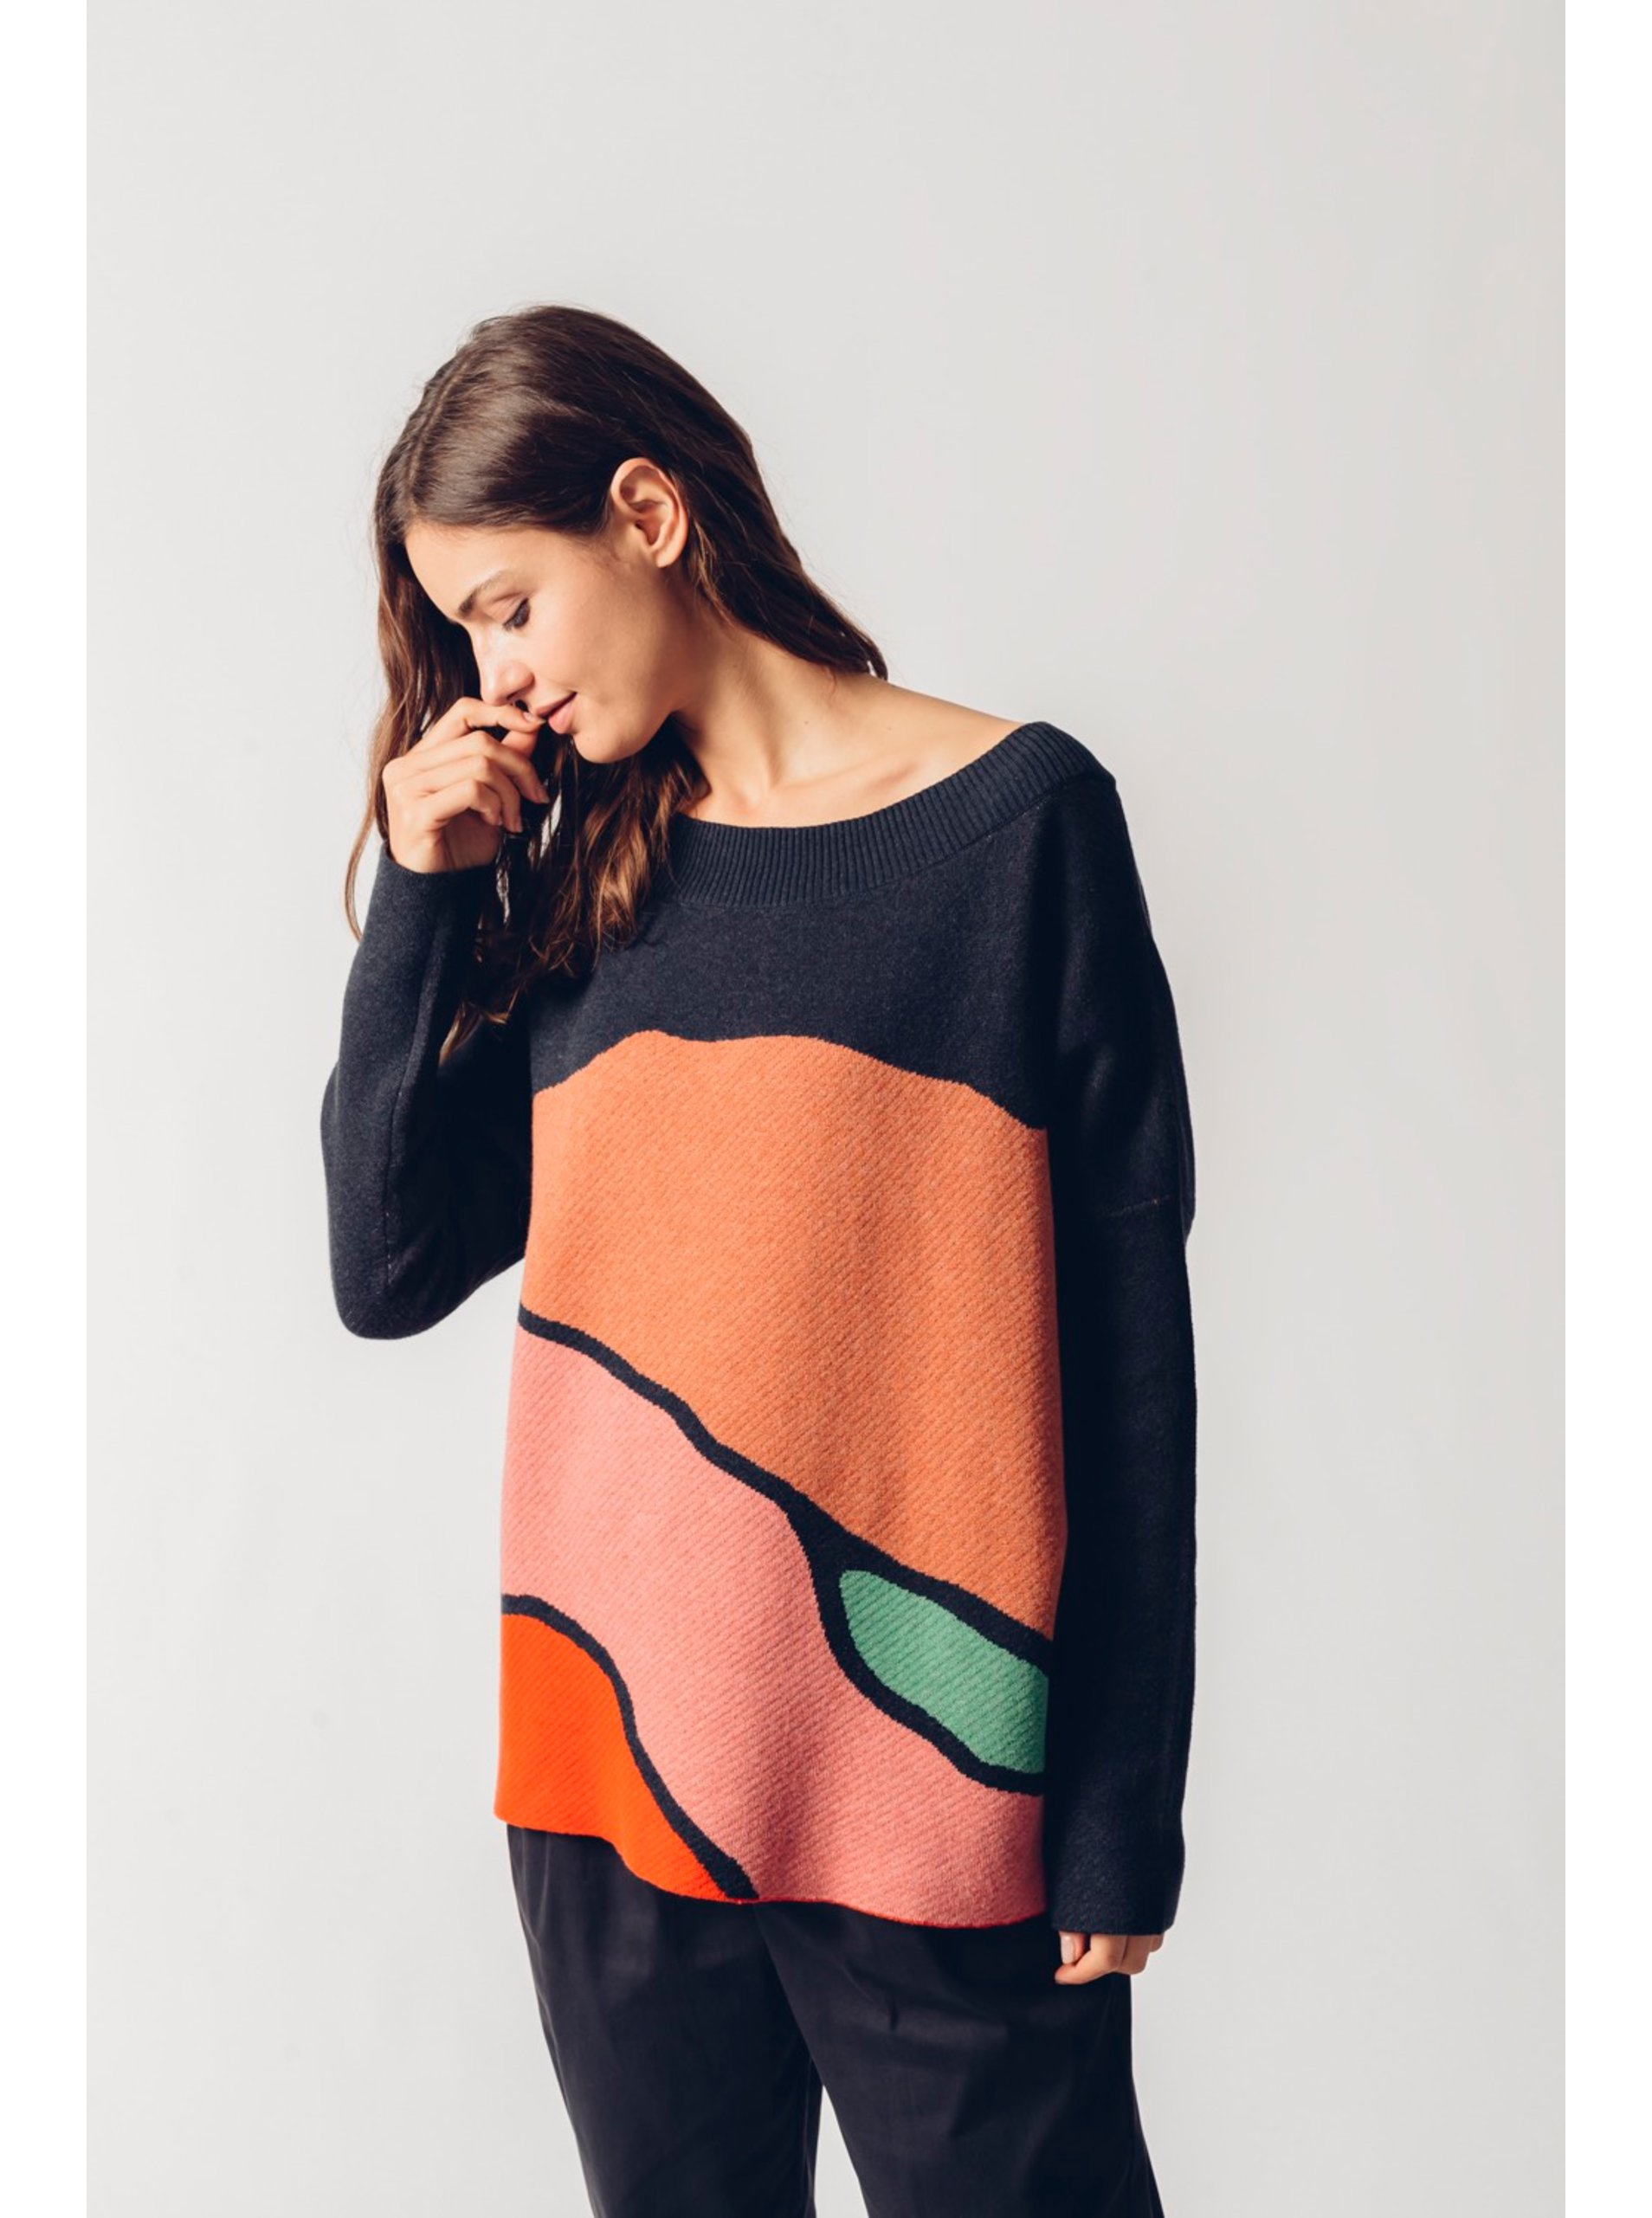 E-shop SKFK barevný oversize svetr Karle